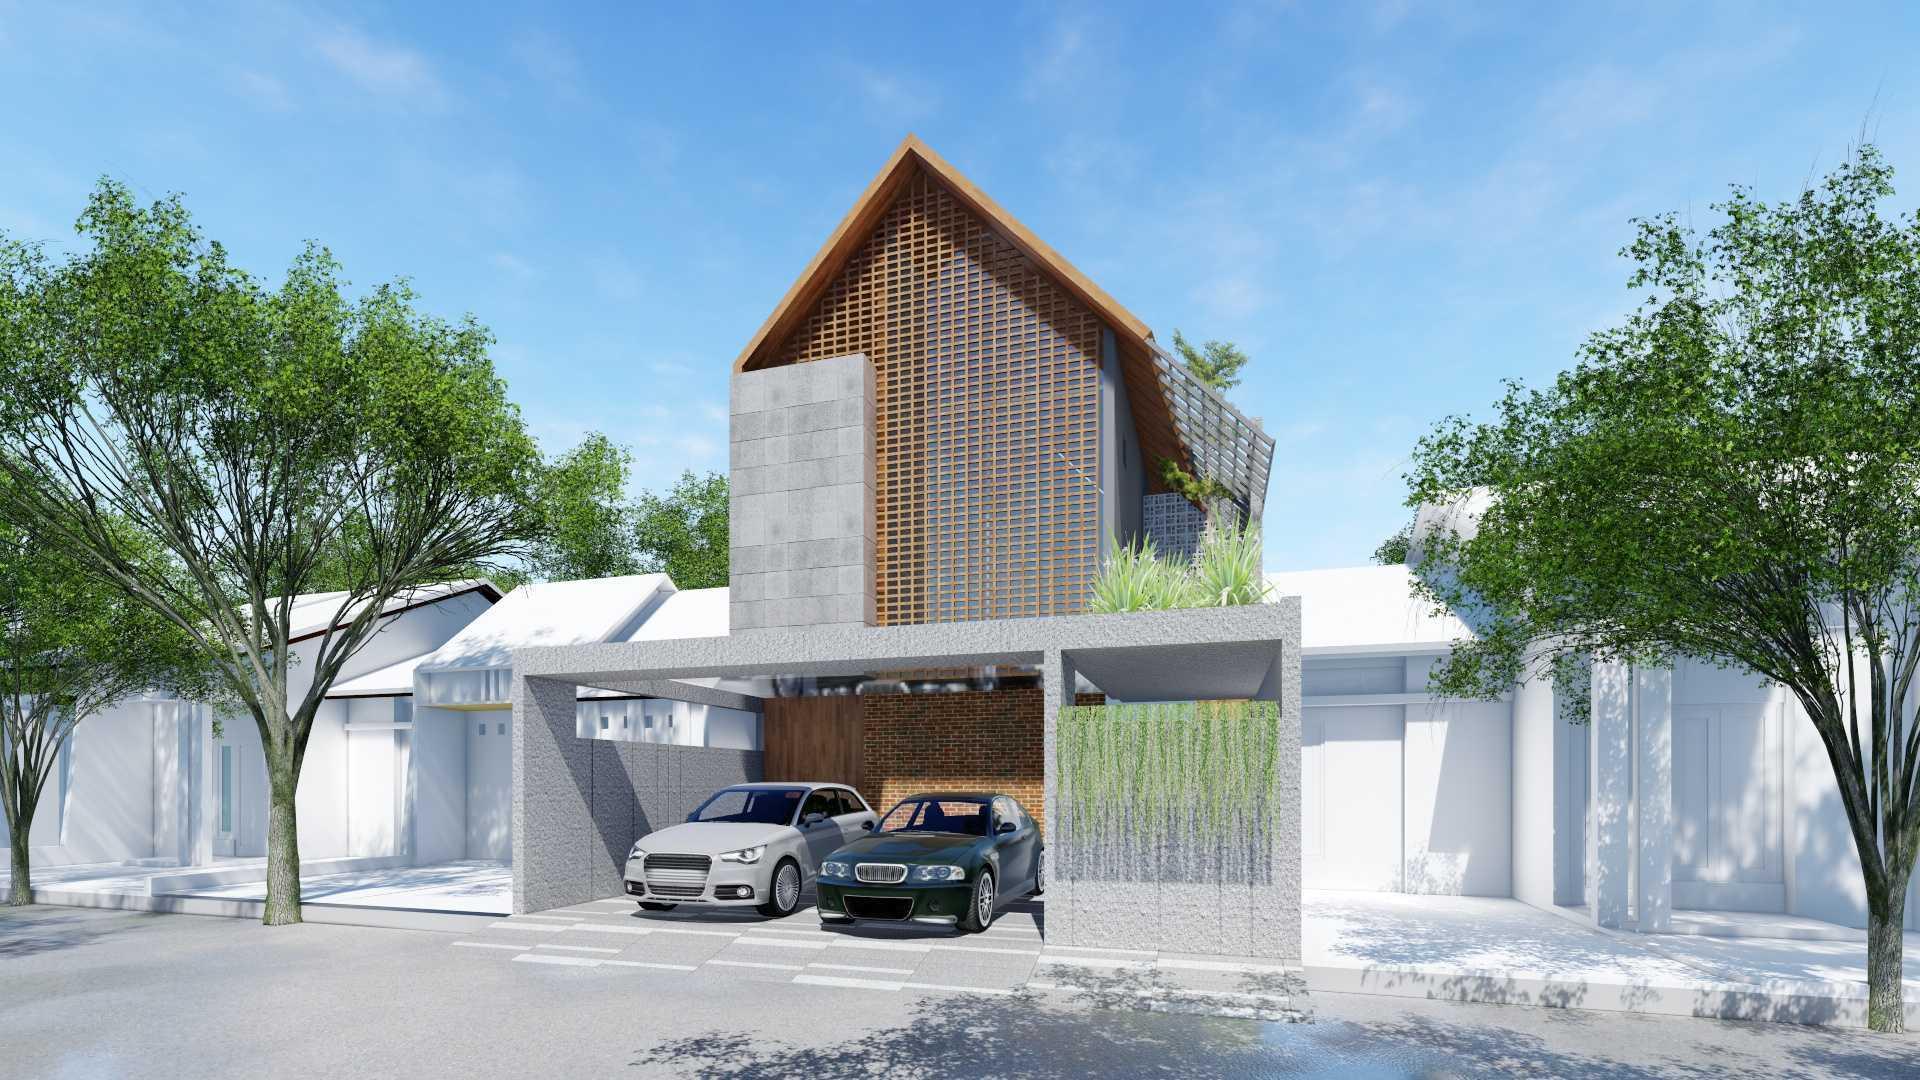 Adefa Studio Md House Bogor, Jawa Barat, Indonesia Bogor, Jawa Barat, Indonesia Exterior View Tropical  50629